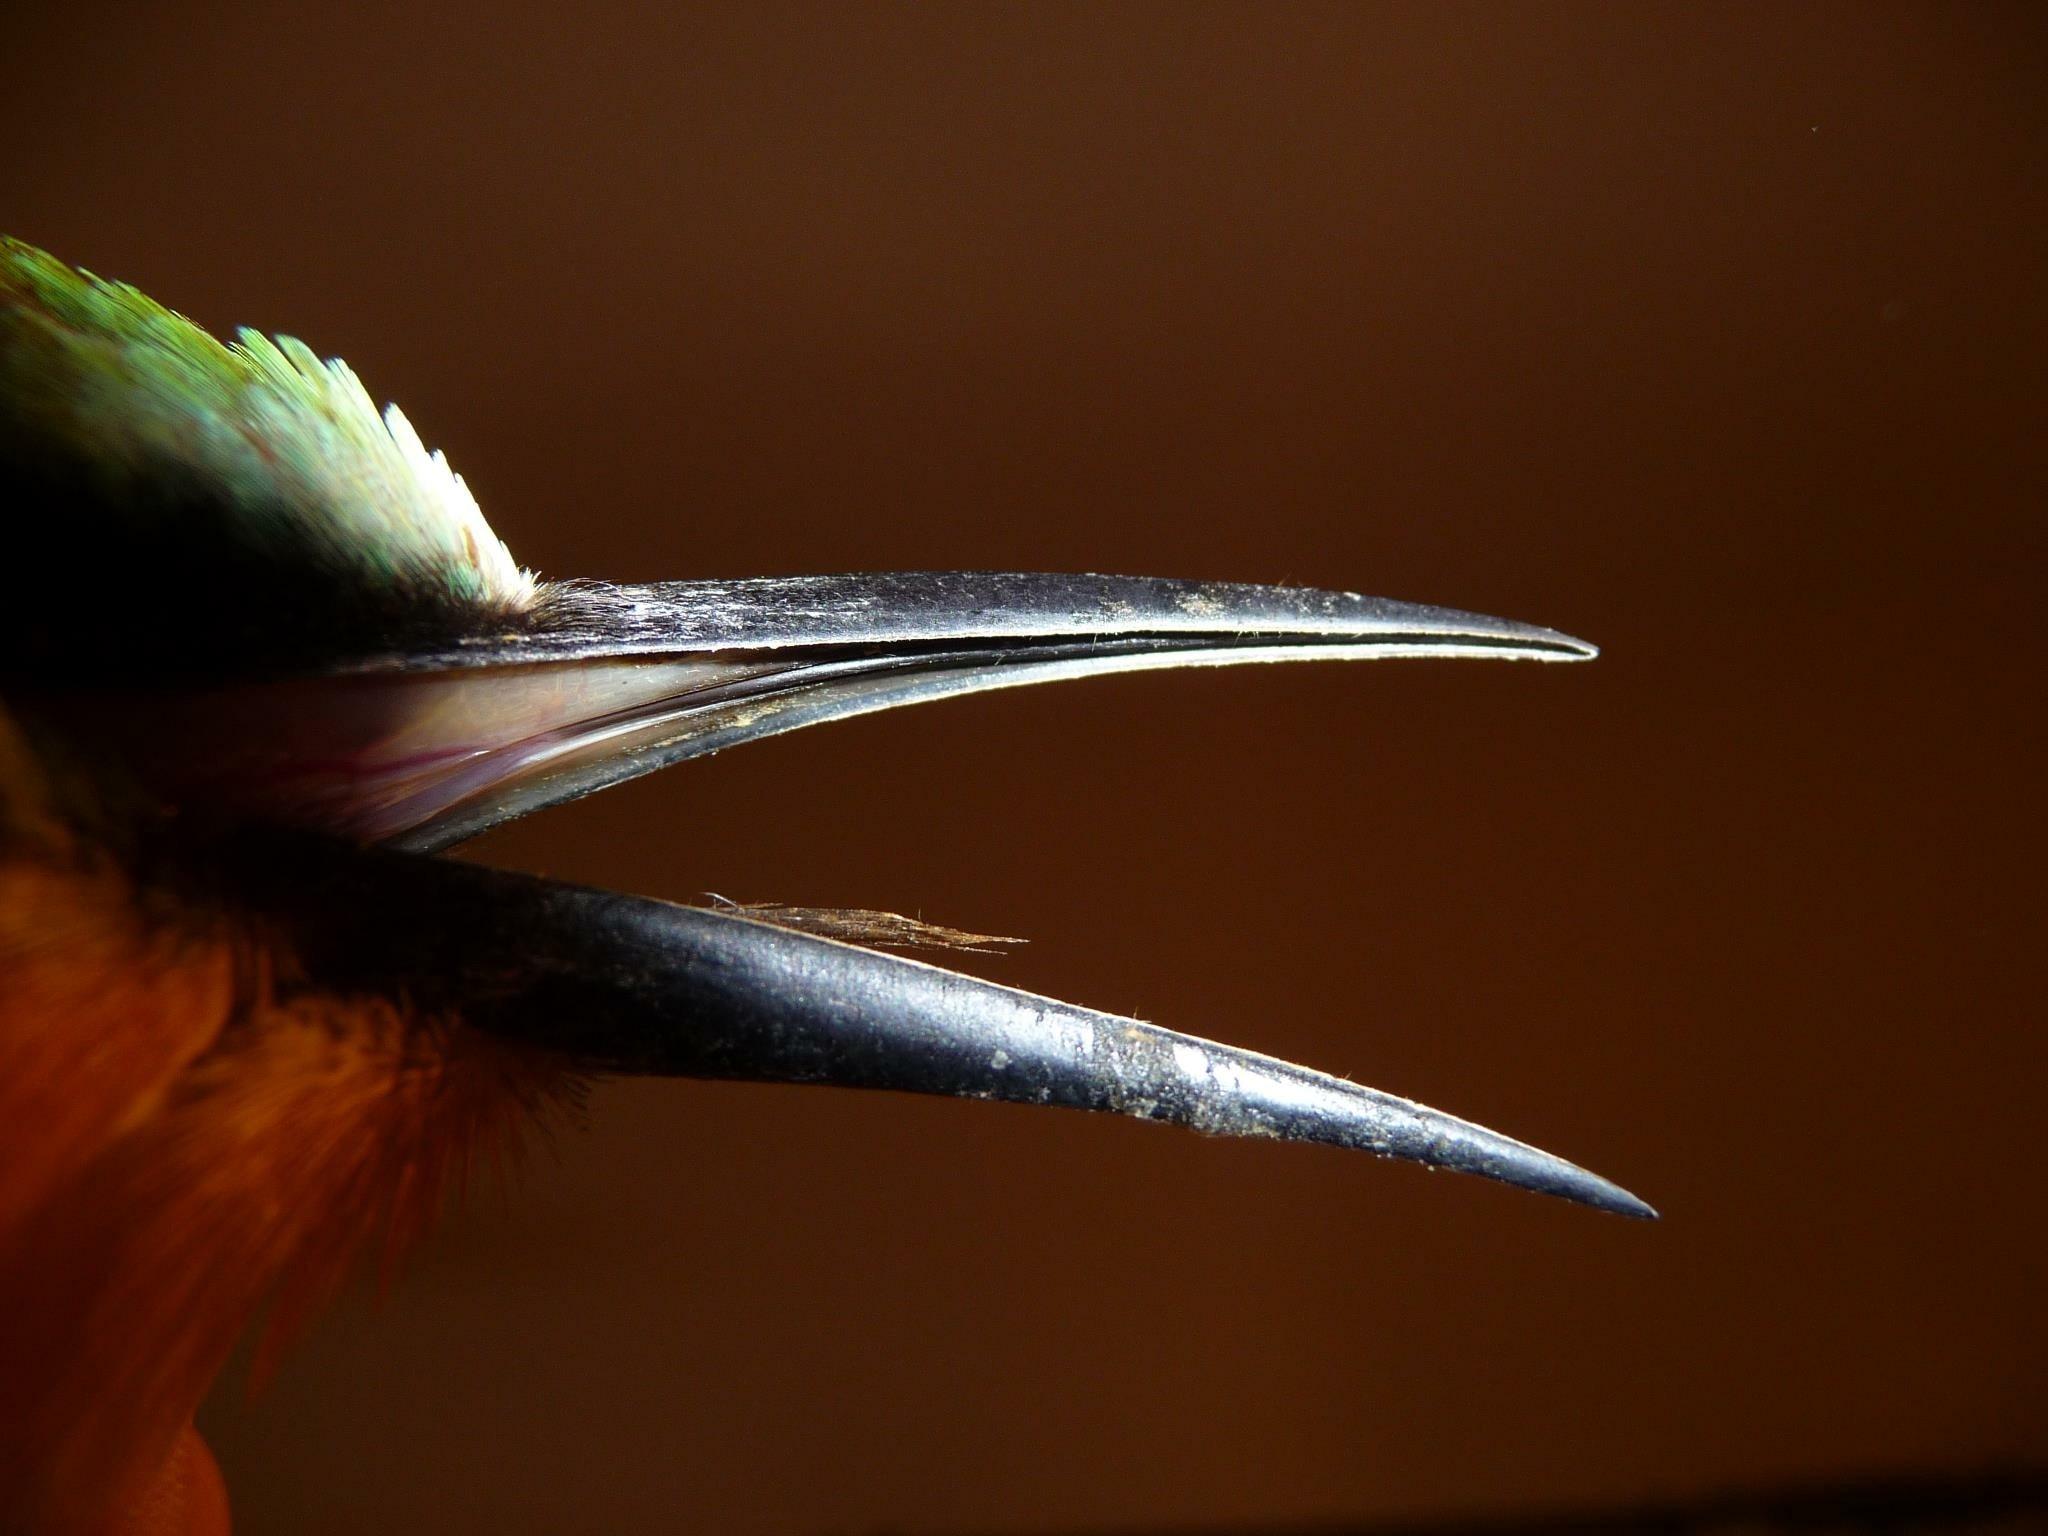 close up photo of black bird beak